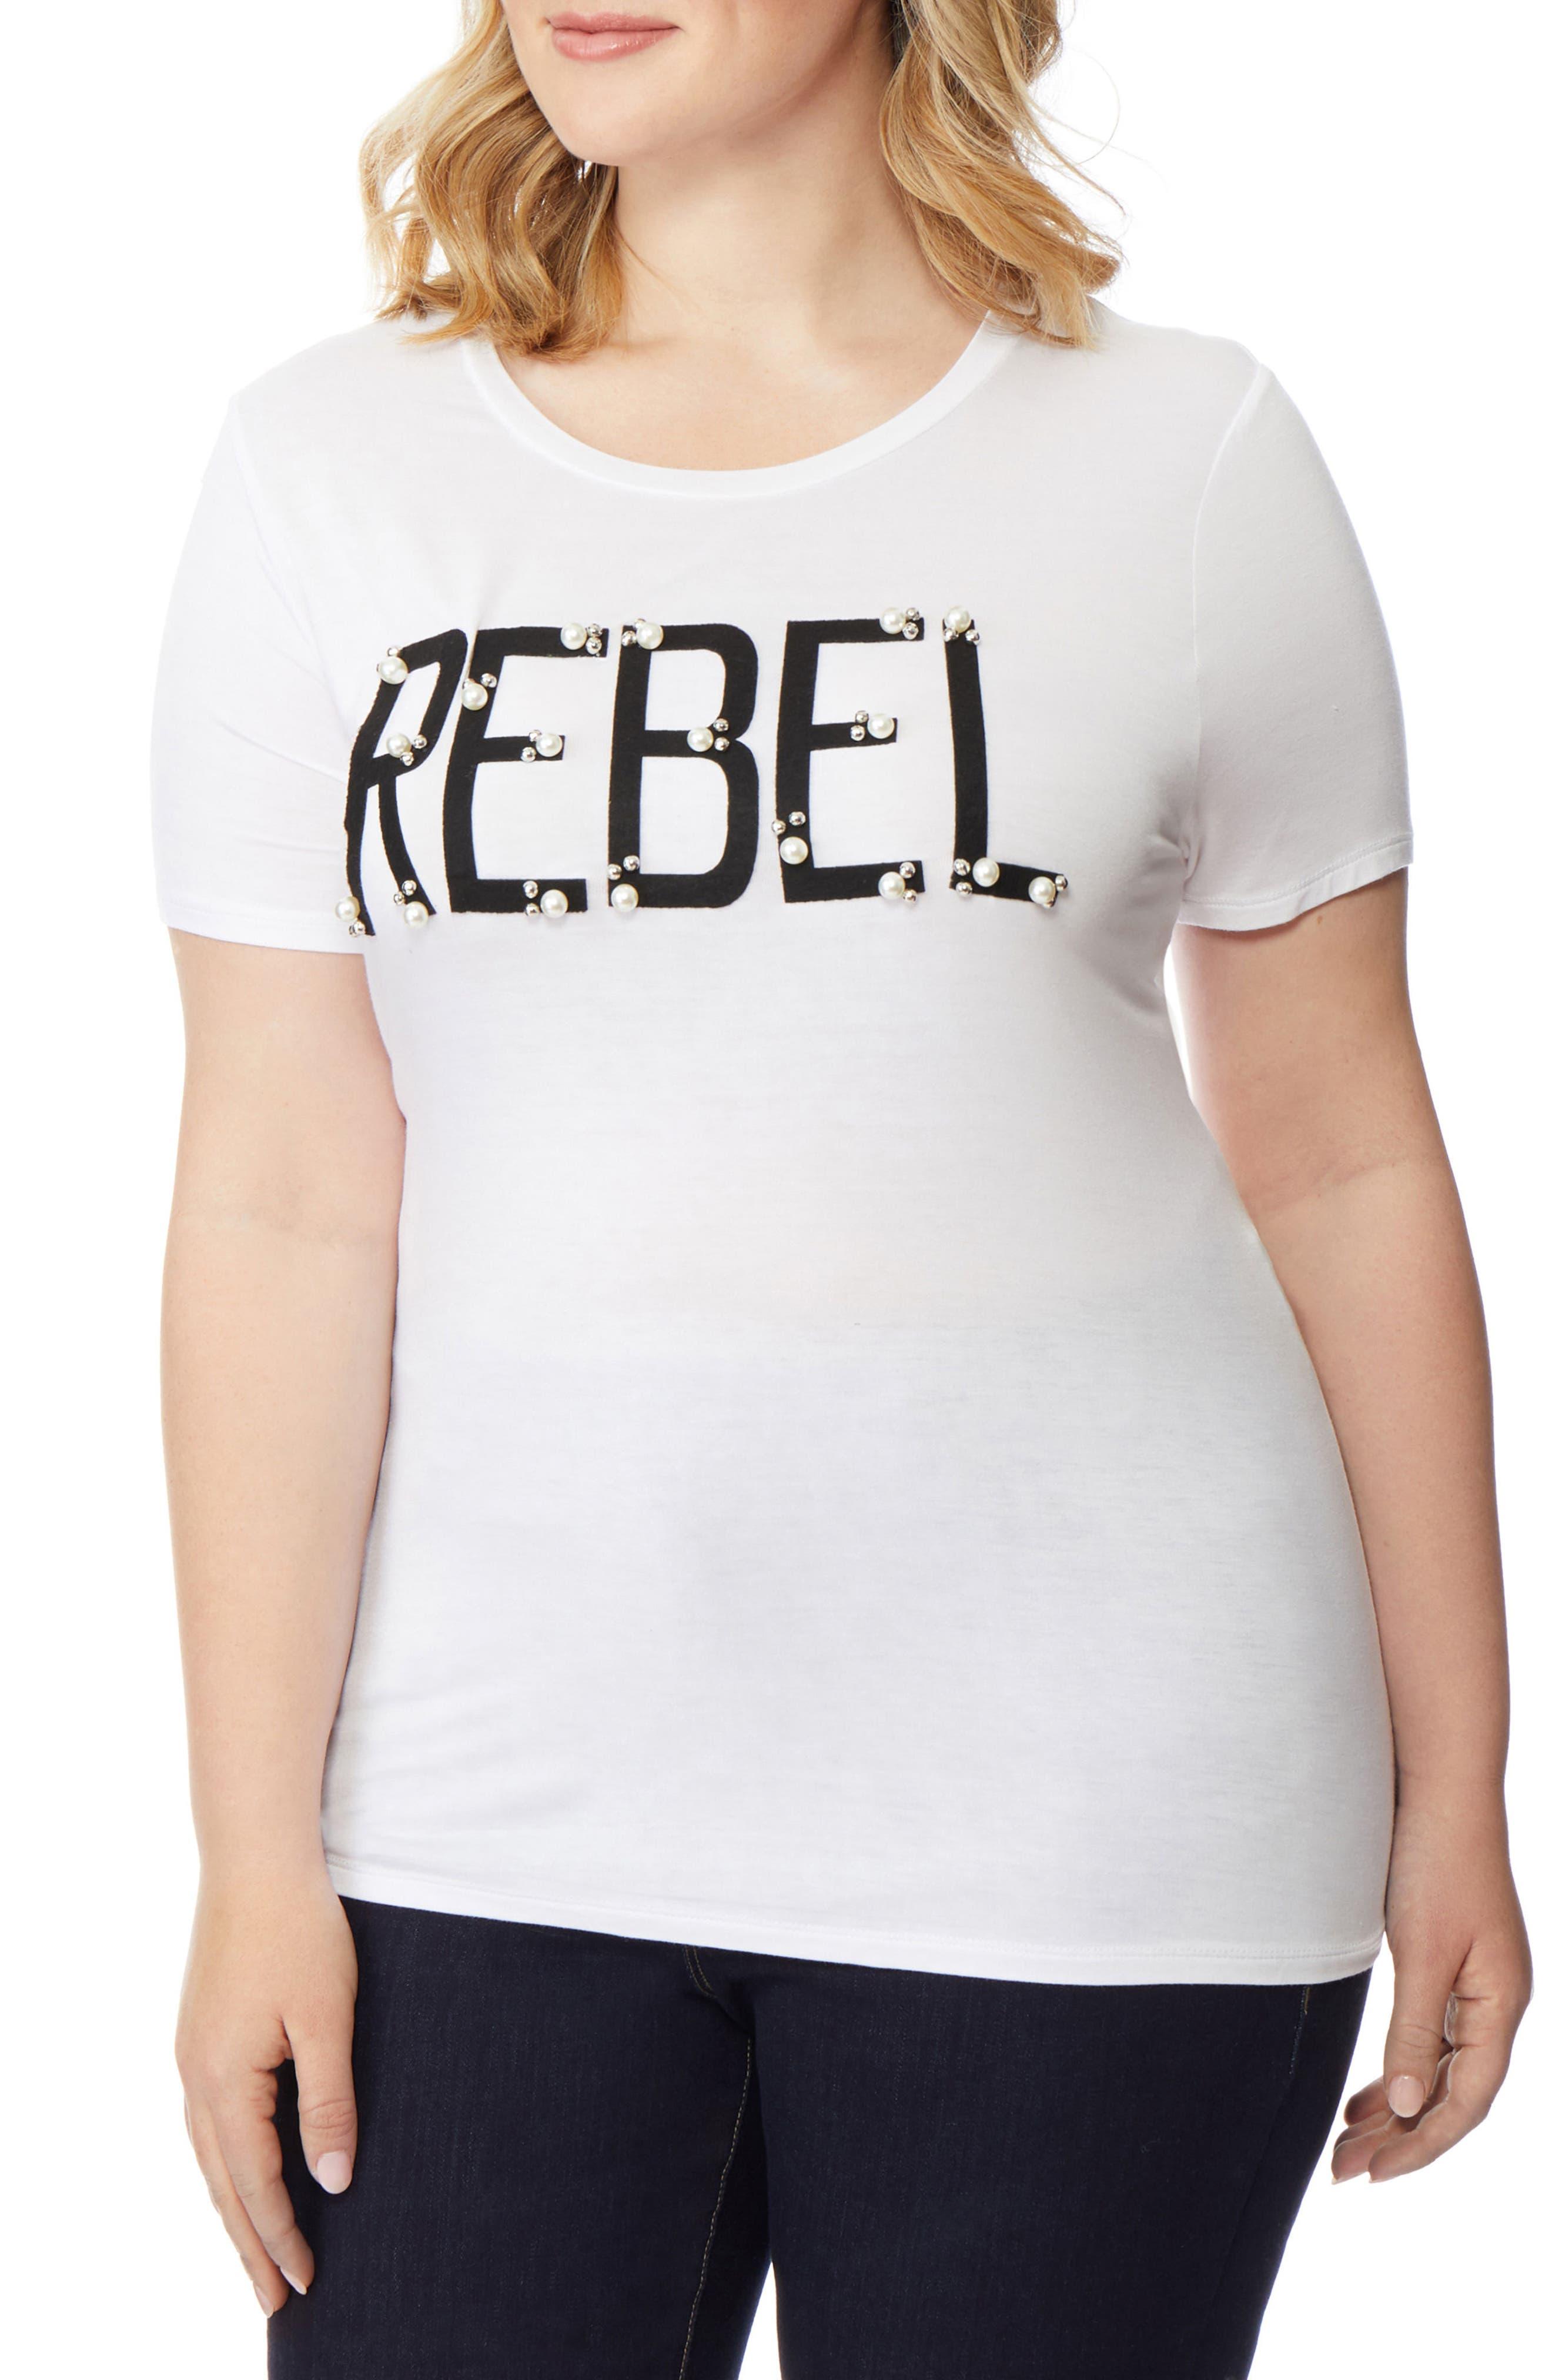 Rebel Embellished Graphic Tee,                             Alternate thumbnail 3, color,                             PEARLED REBEL